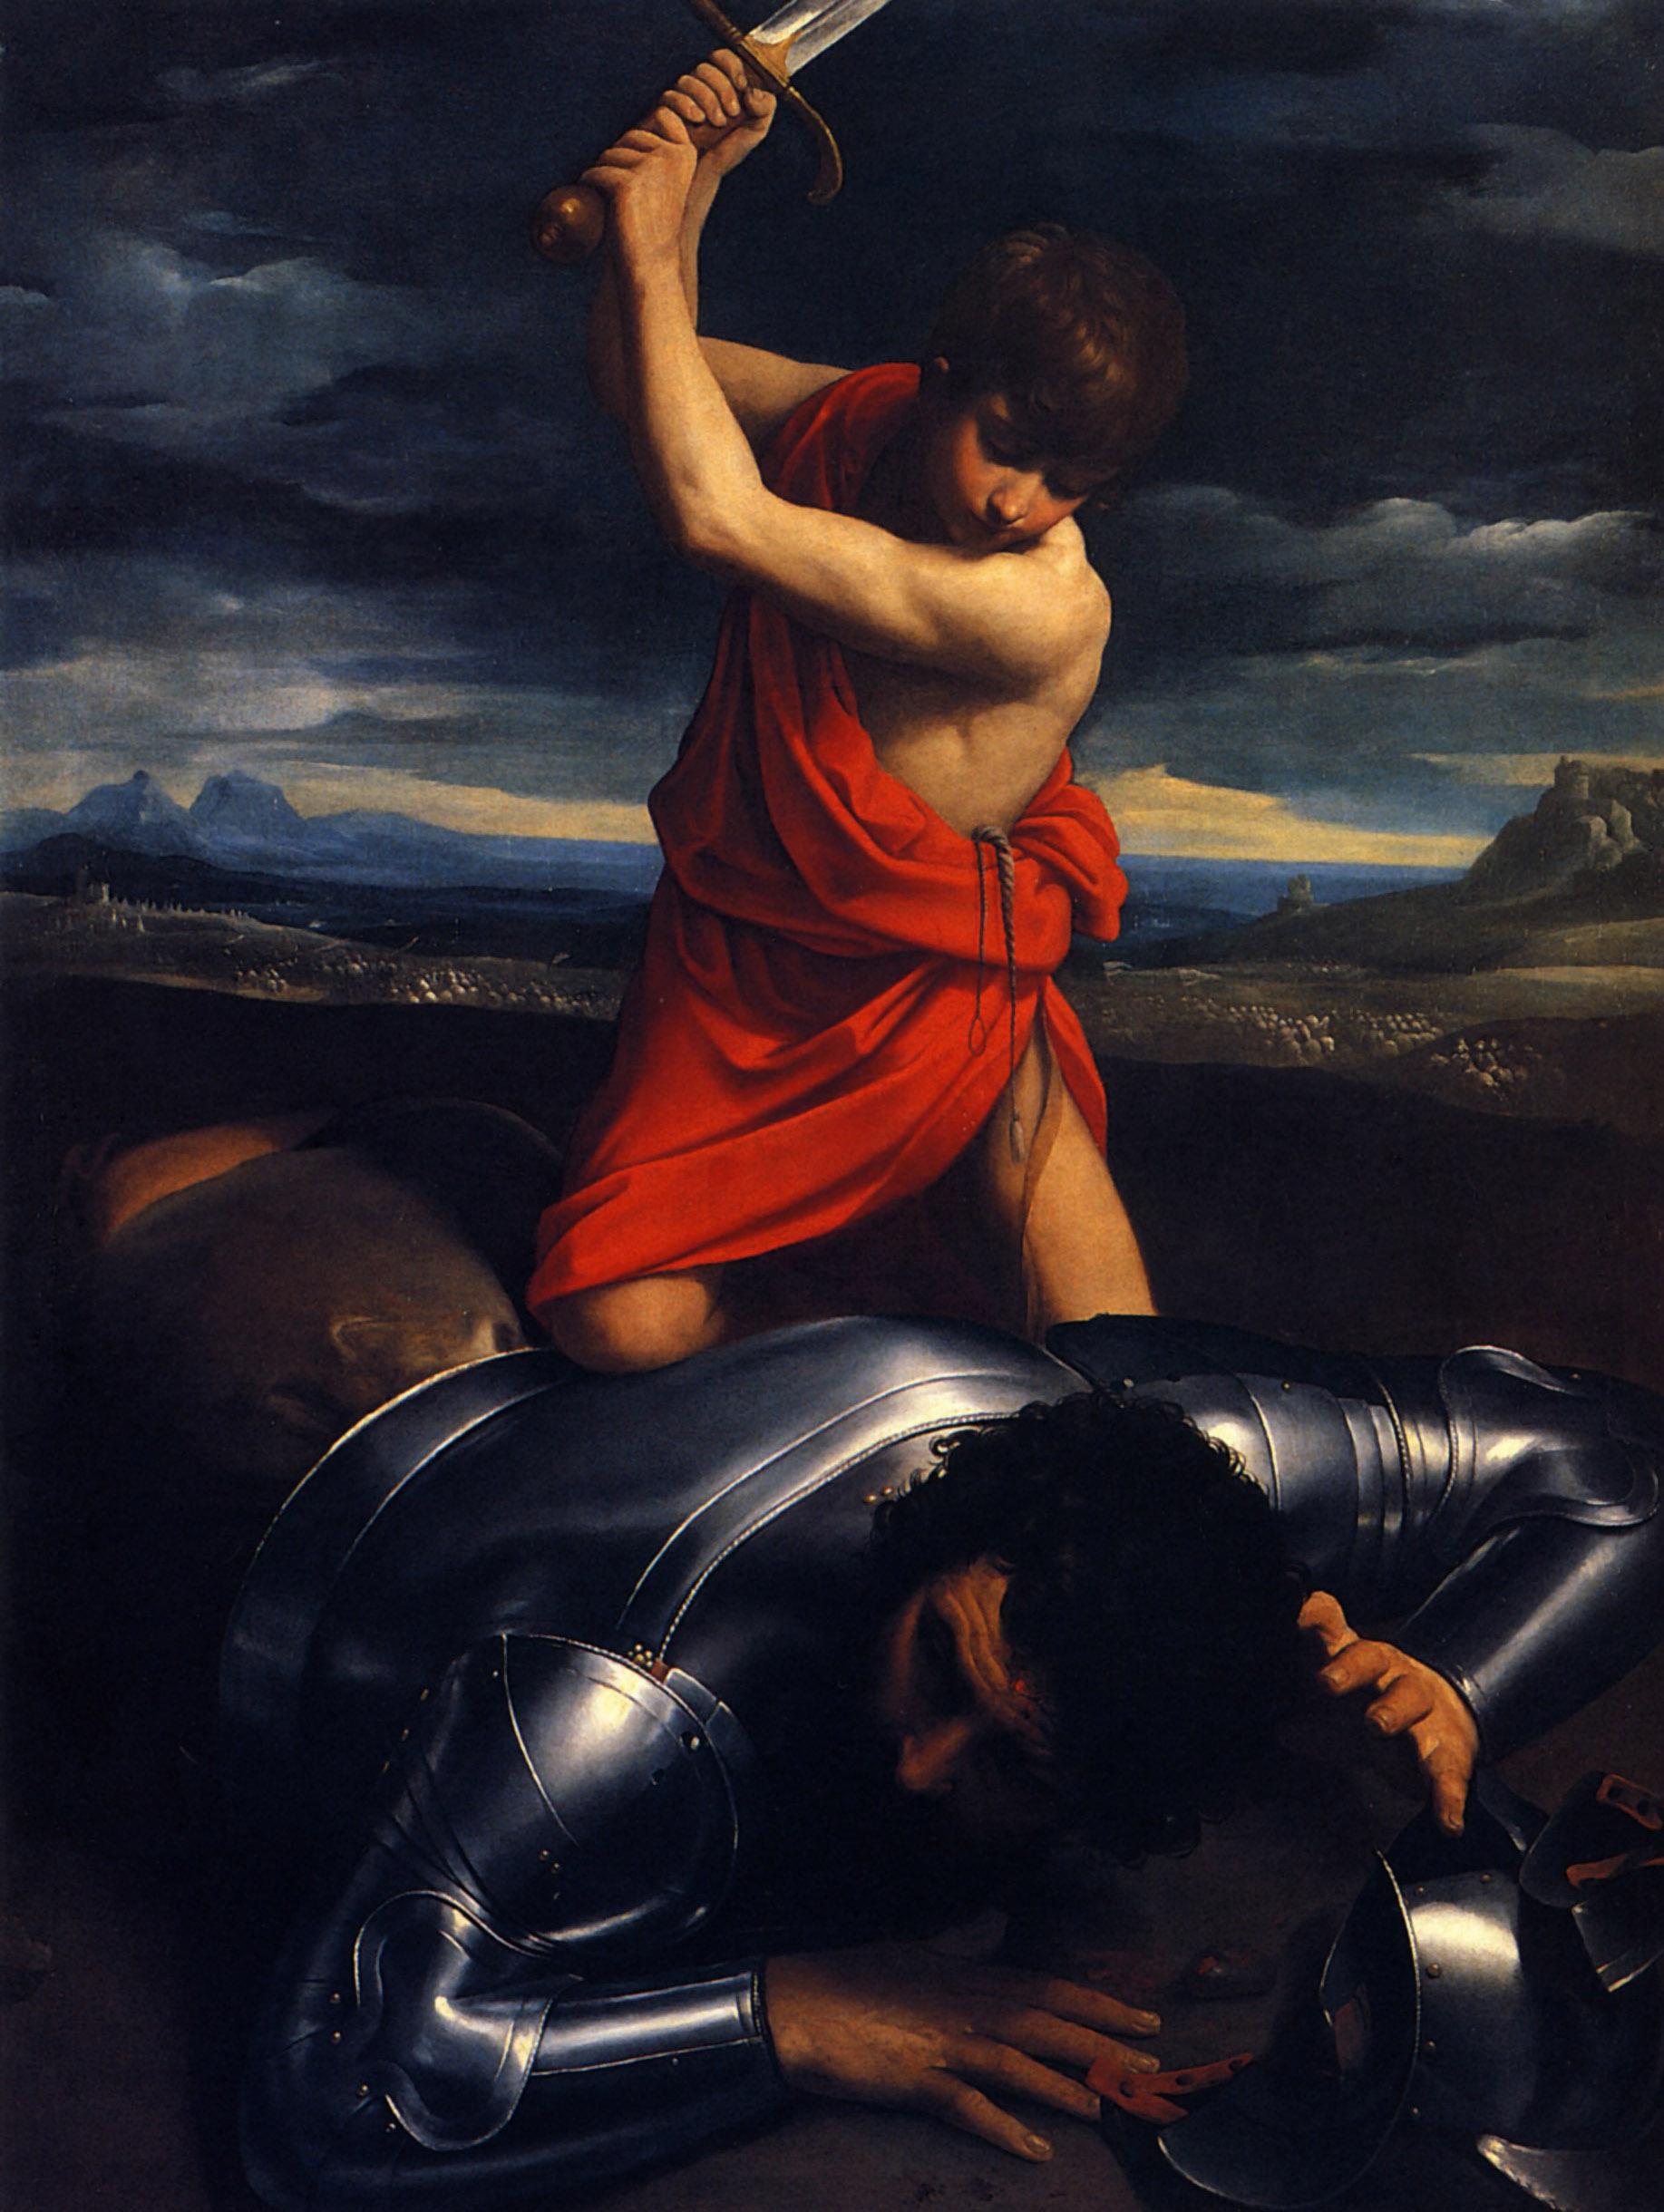 David And Goliath Art David And Goliath Art Renaissance